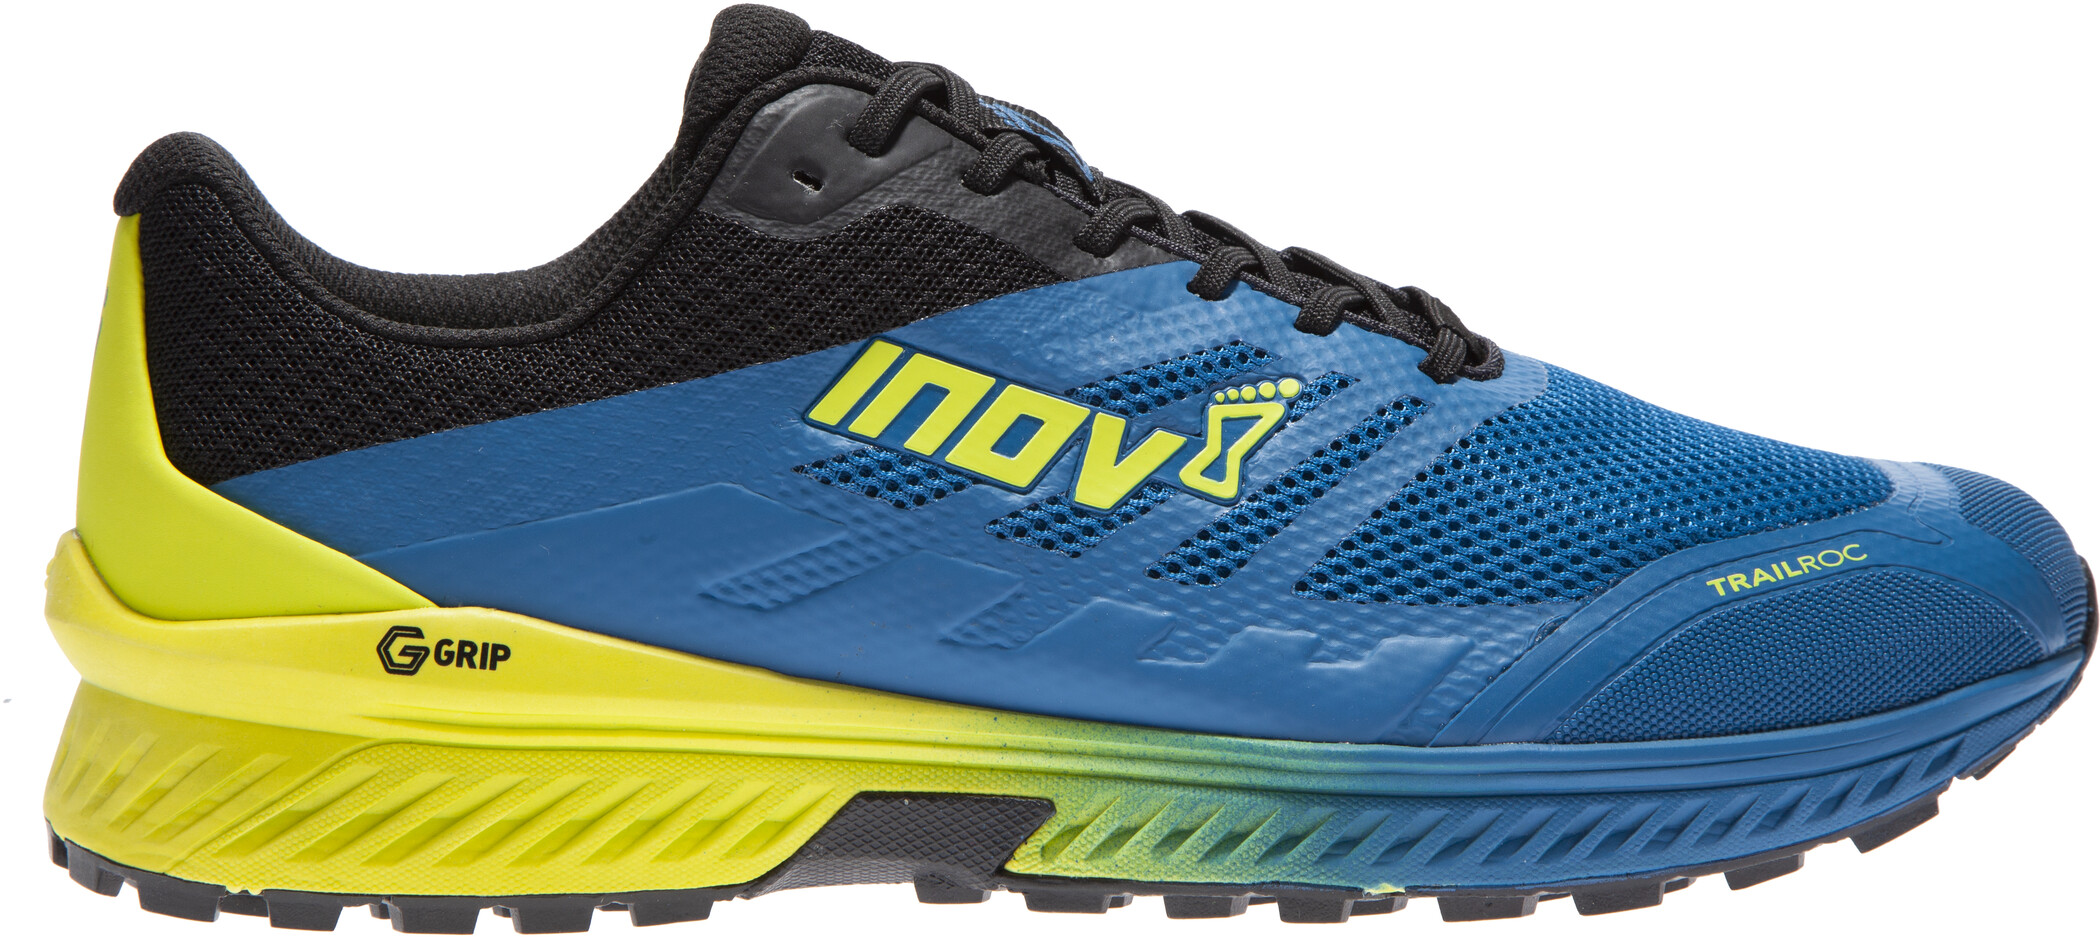 adidas NEO CONEO Dance PIONA Sneaker Lifestyle Schuhe, Gr. 37,5